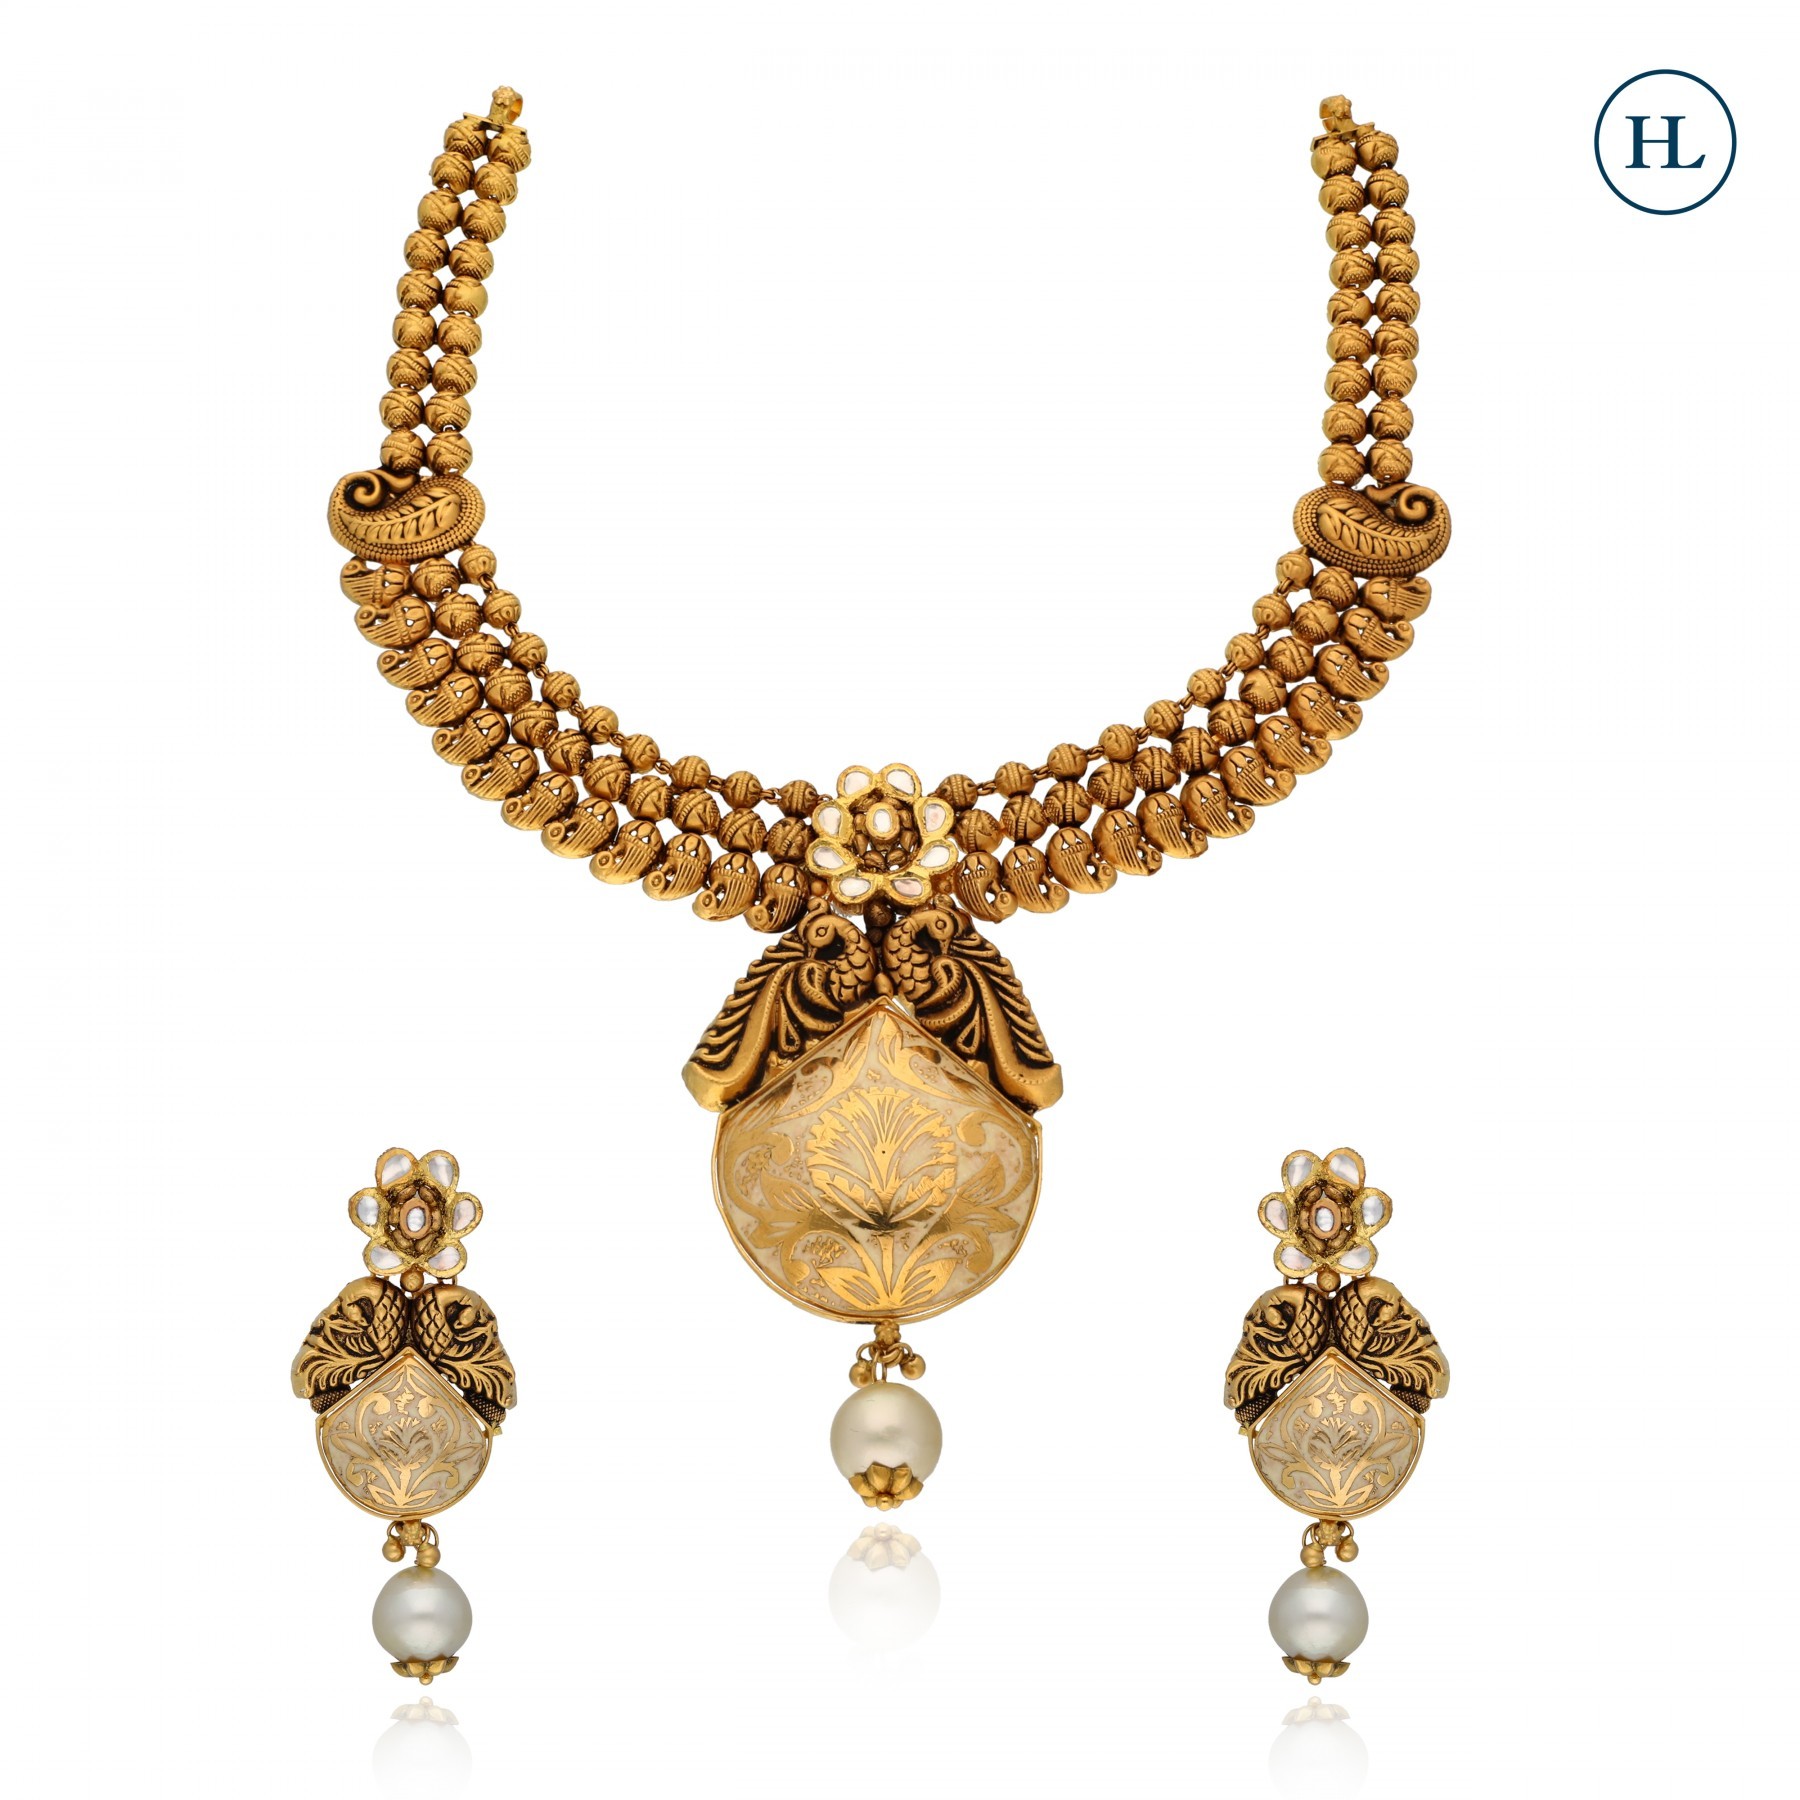 Antique-Styled Gold Enamel Necklace Set